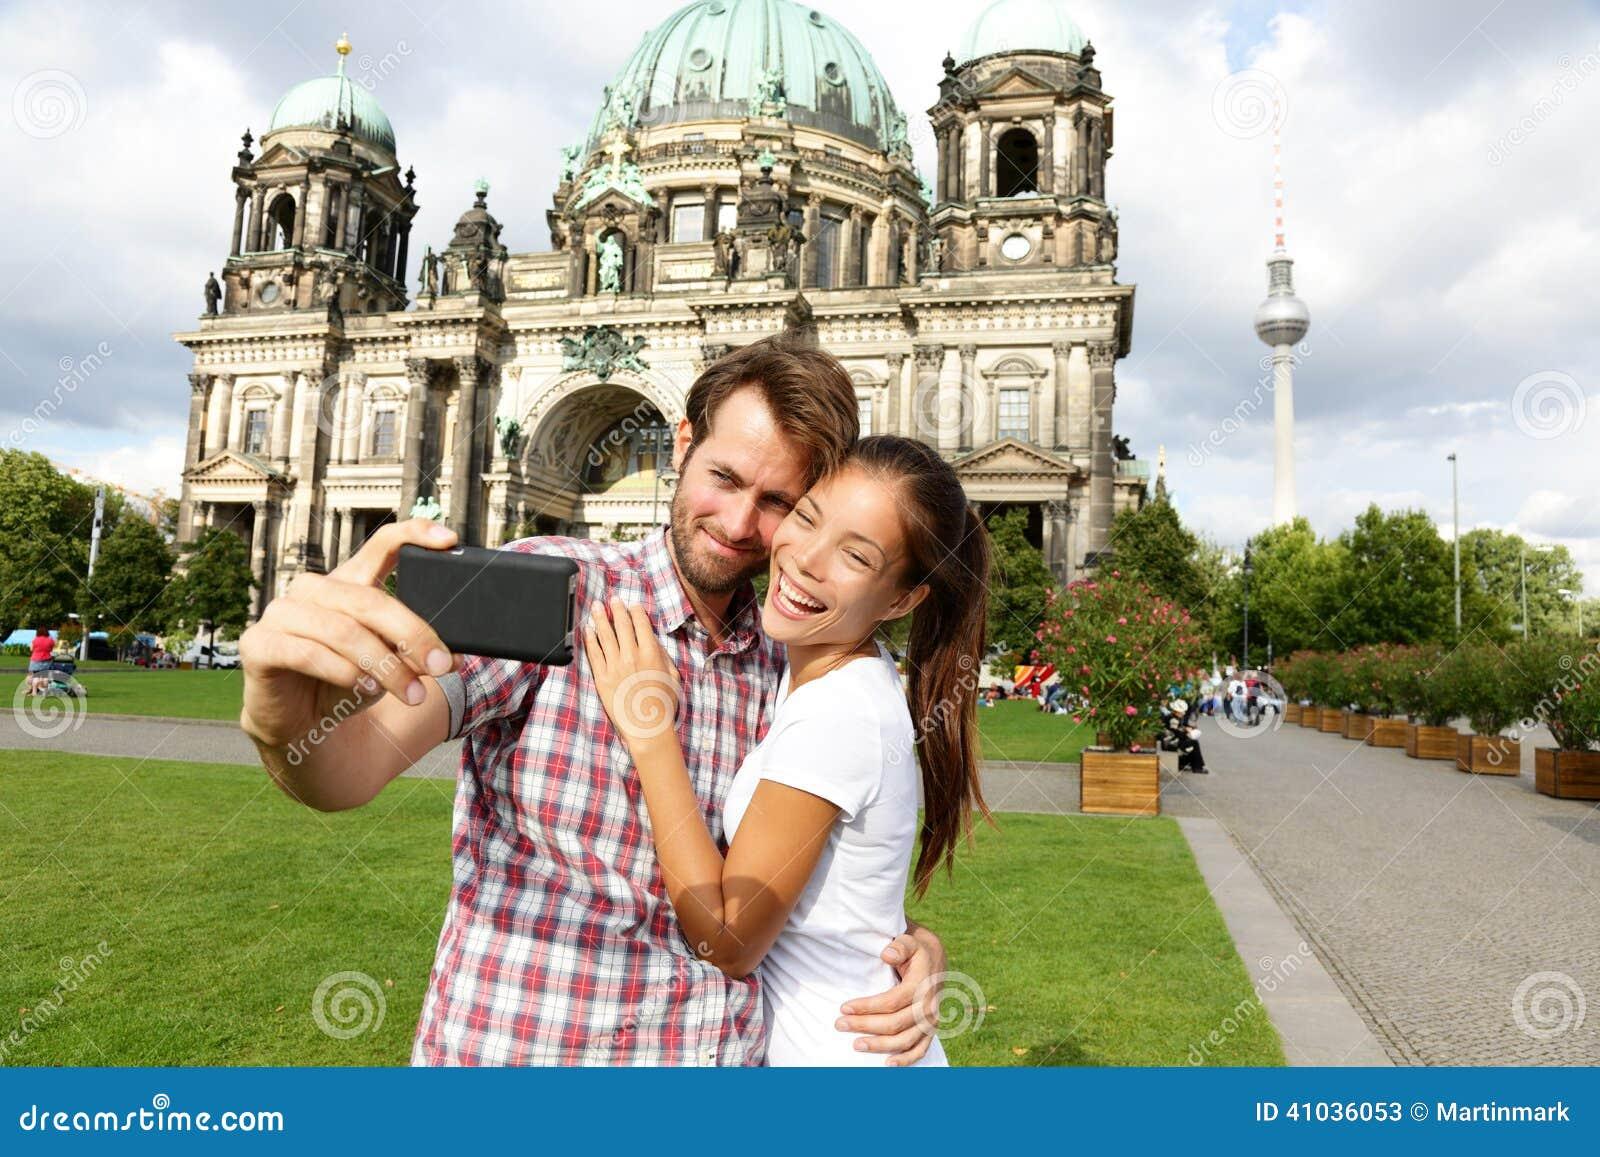 for that interfere Singles Rehlingen-Siersburg jetzt kostenlos kennenlernen God! Well and